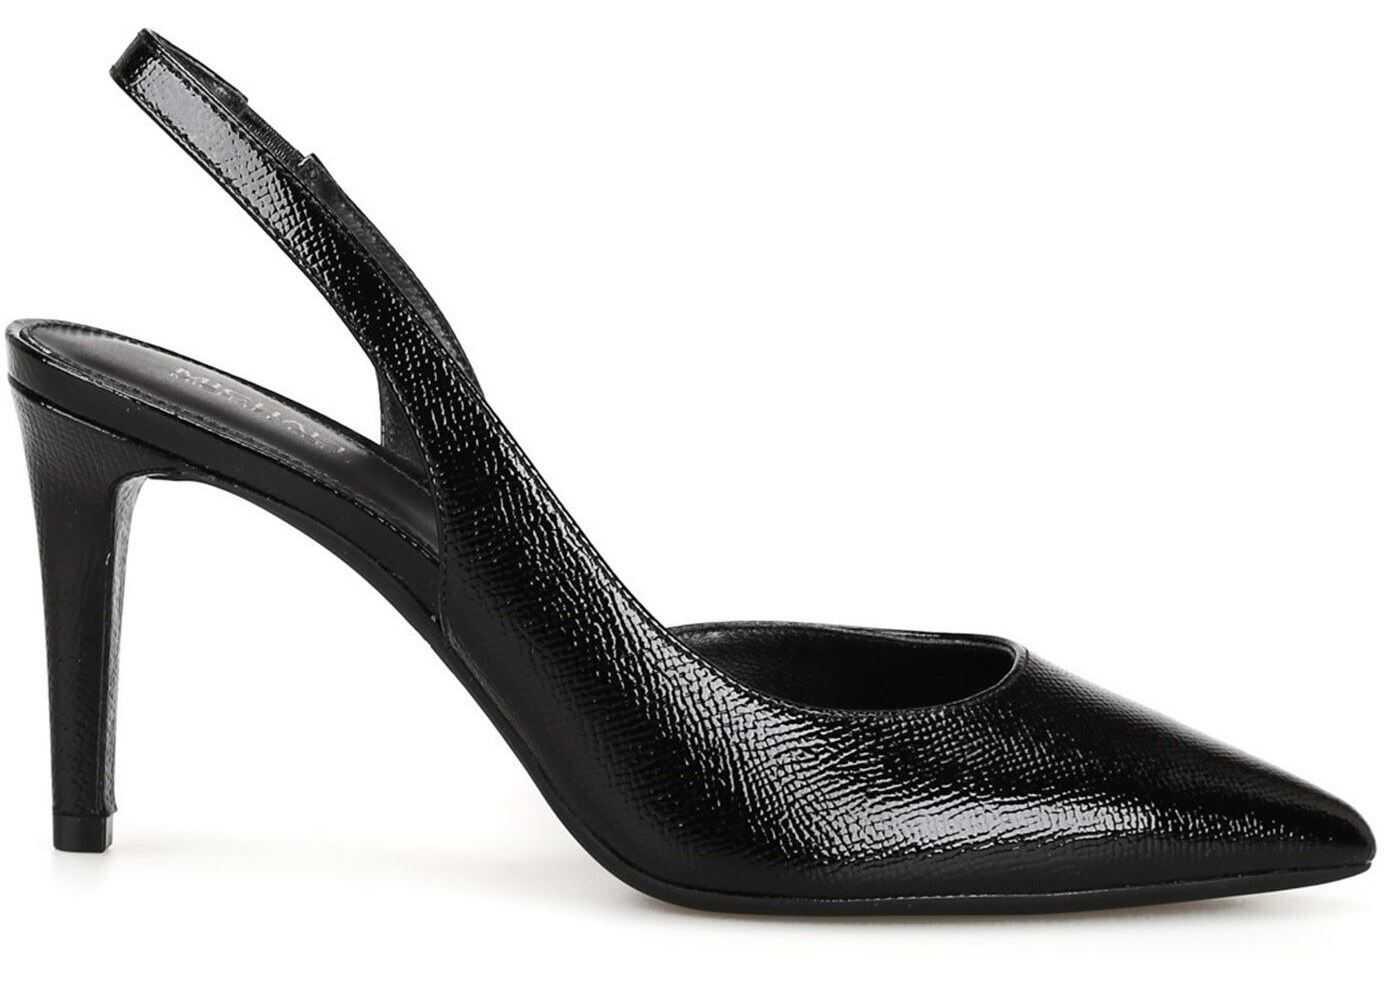 Michael Kors Lucille Black Embossed Leather Slingbacks Black